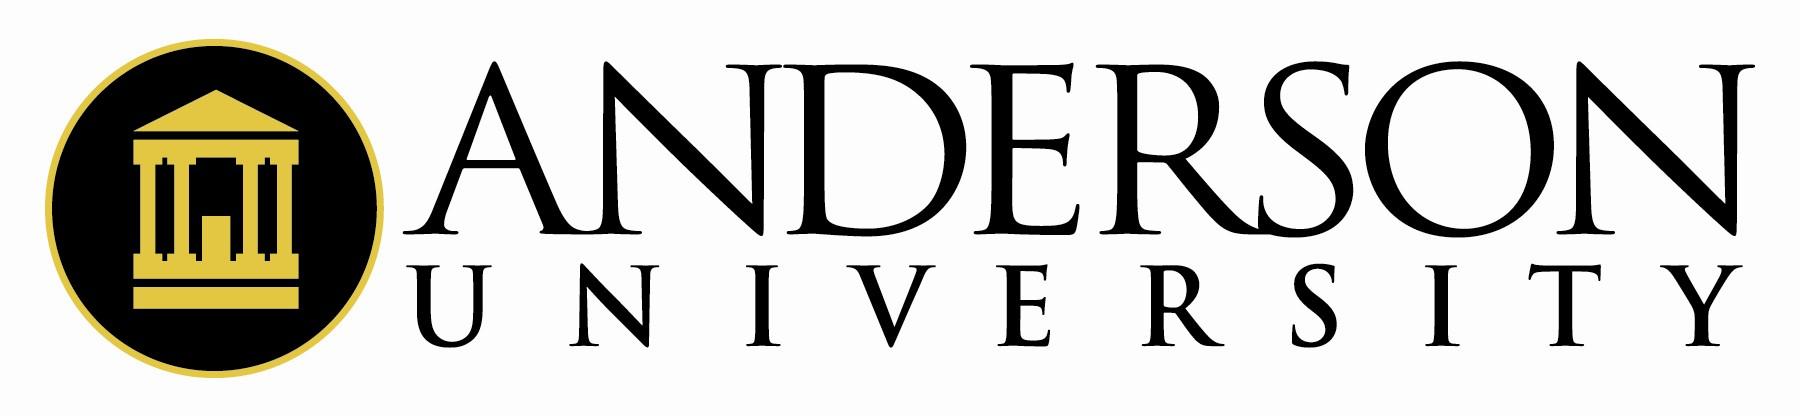 Anderson_University.jpg